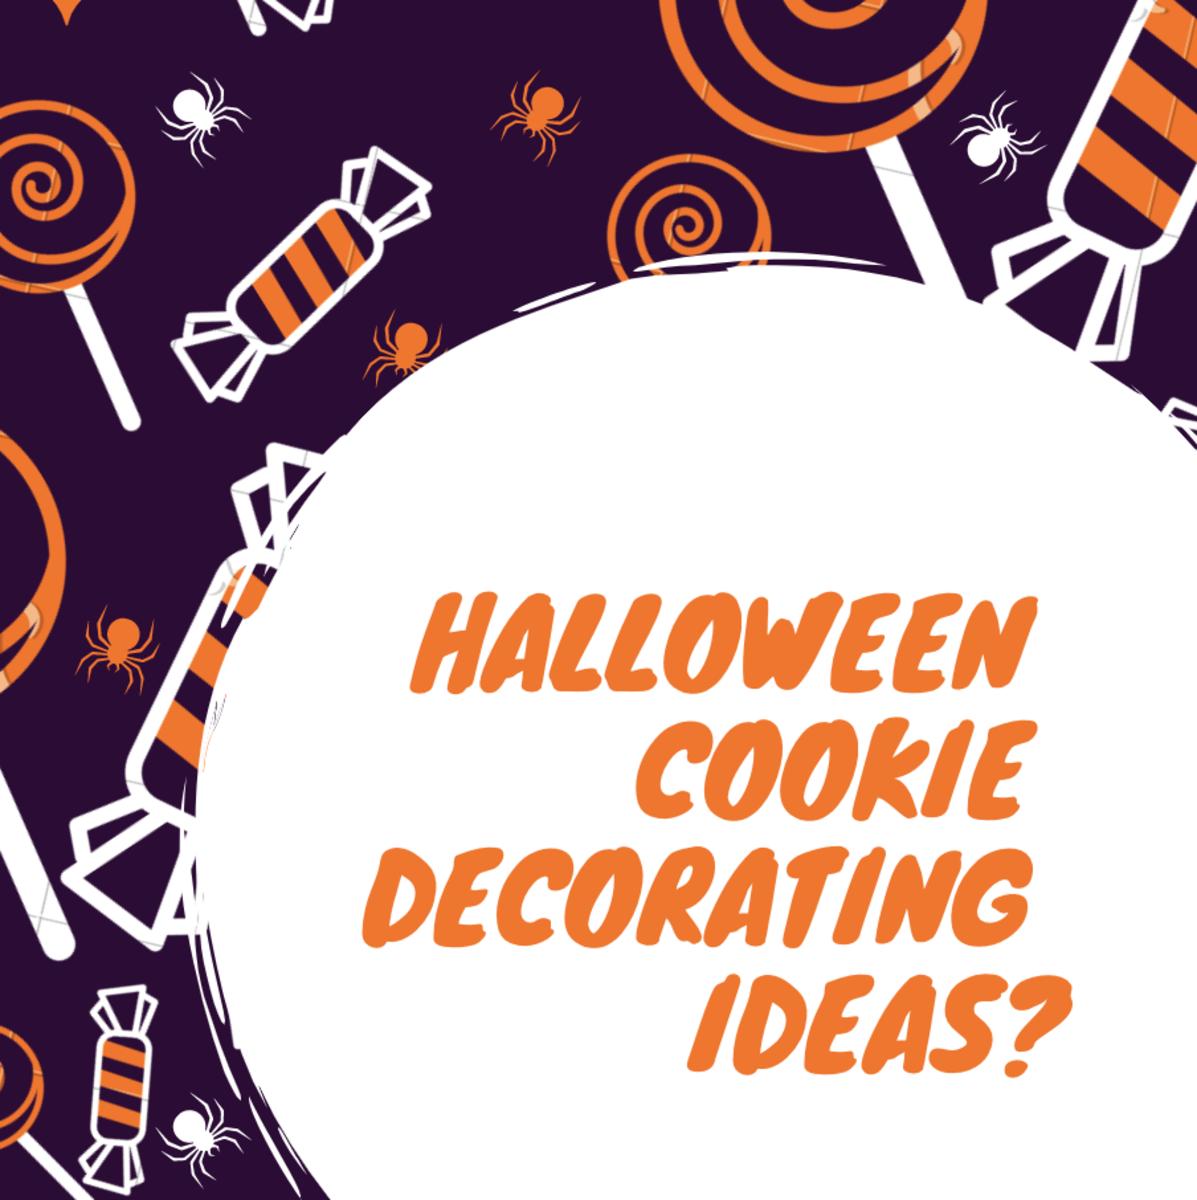 17 Halloween Cookie Decorating Ideas